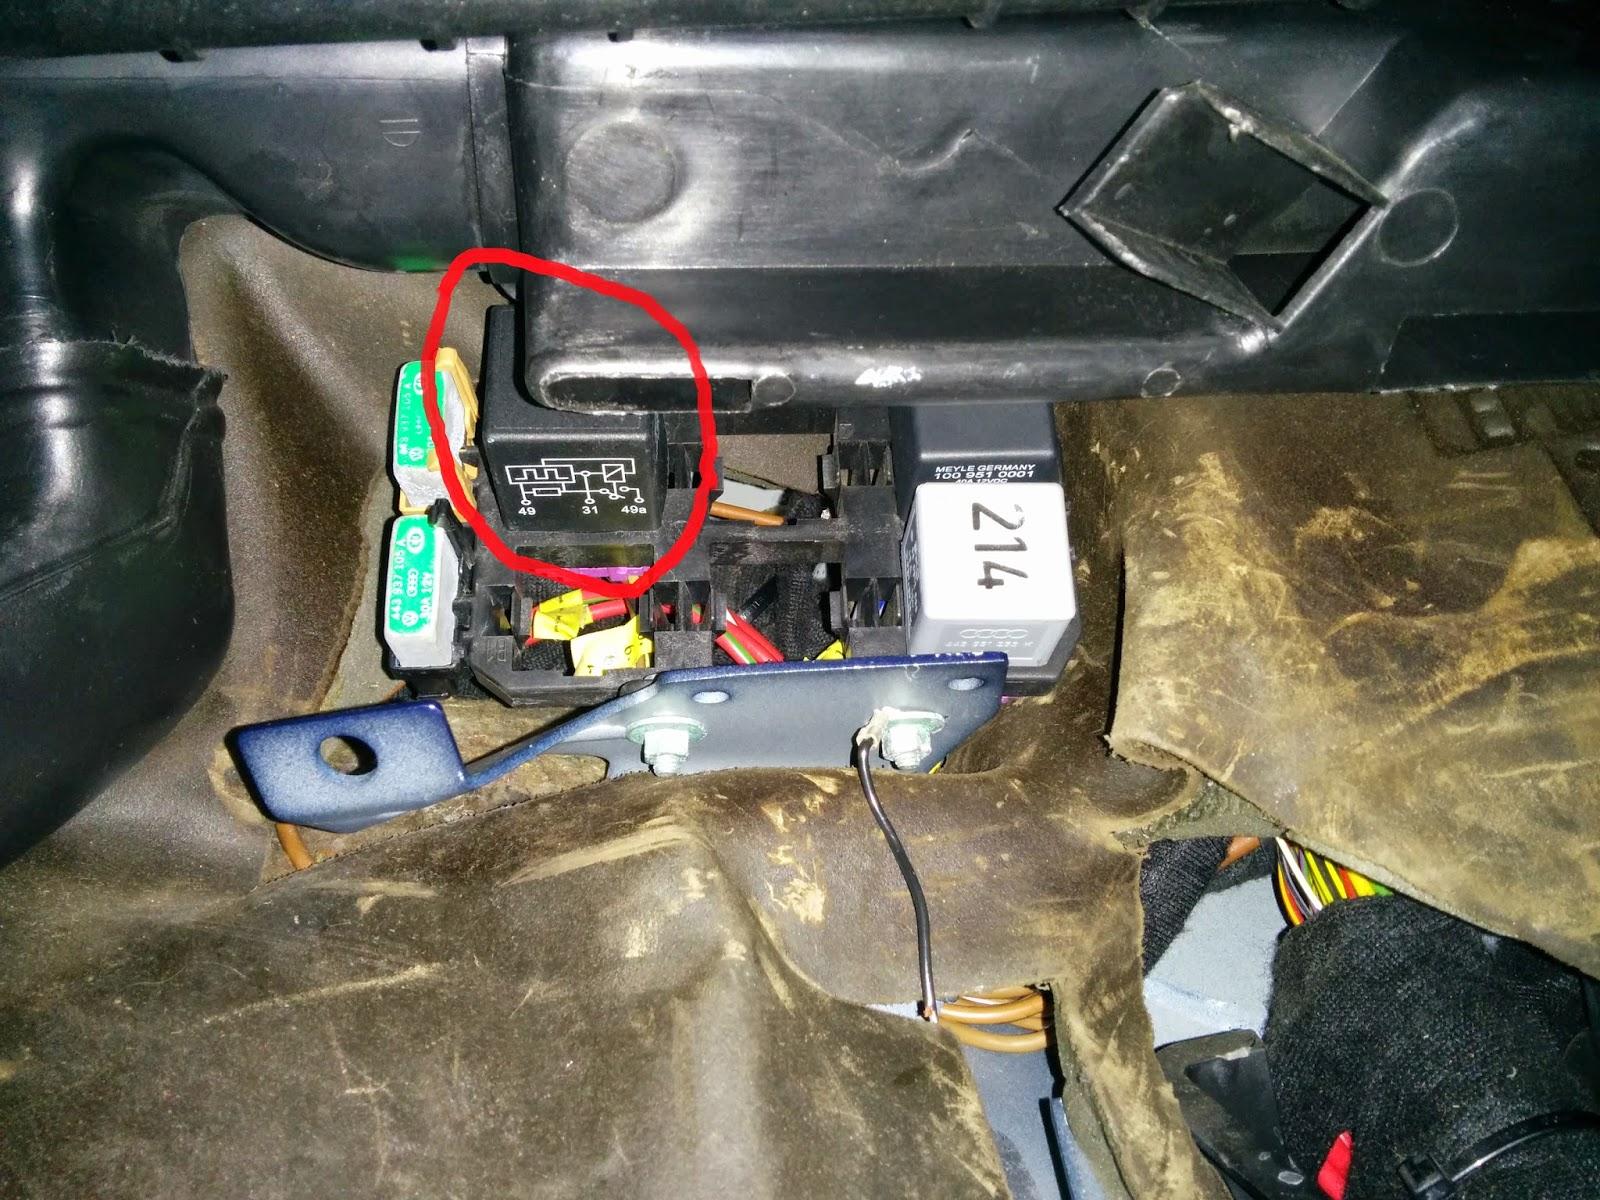 audi tt fuse box on battery